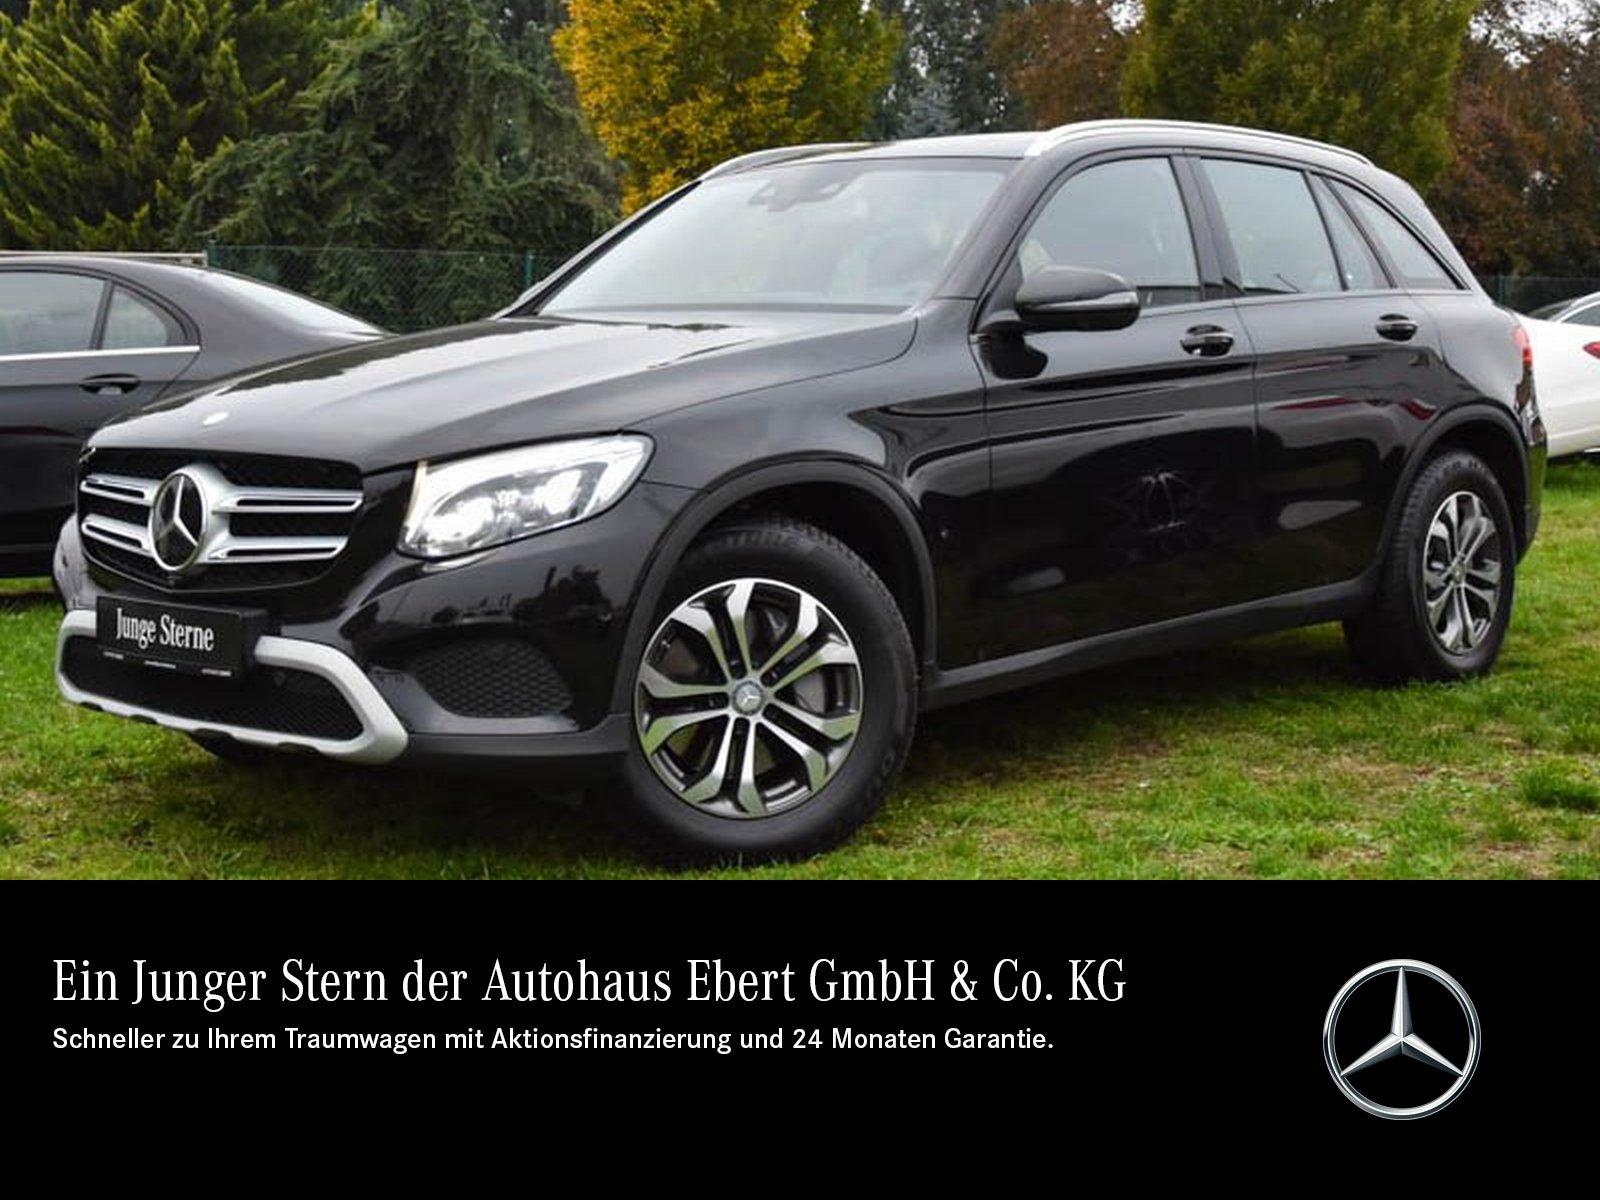 Mercedes-Benz GLC 250 d 4M 9G+COMAND+PSD+360°+LED+EASY+EU6, Jahr 2015, Diesel